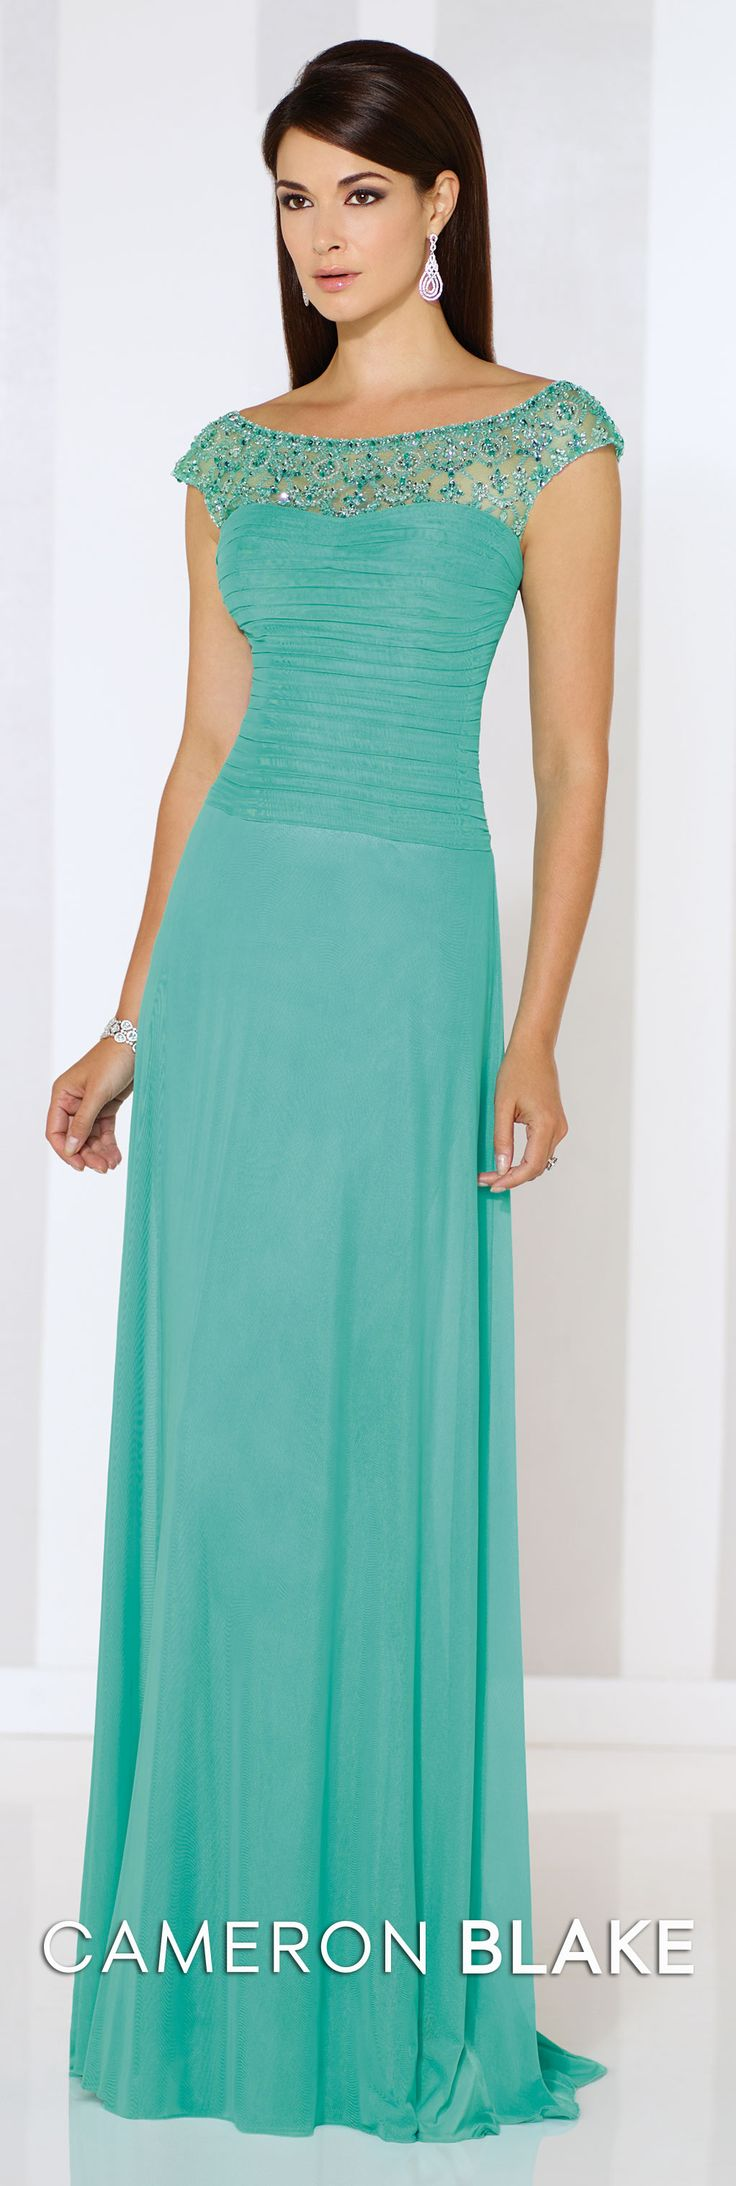 Cameron Blake Spring 2016 - Style No. 116662 #formaleveningdresses